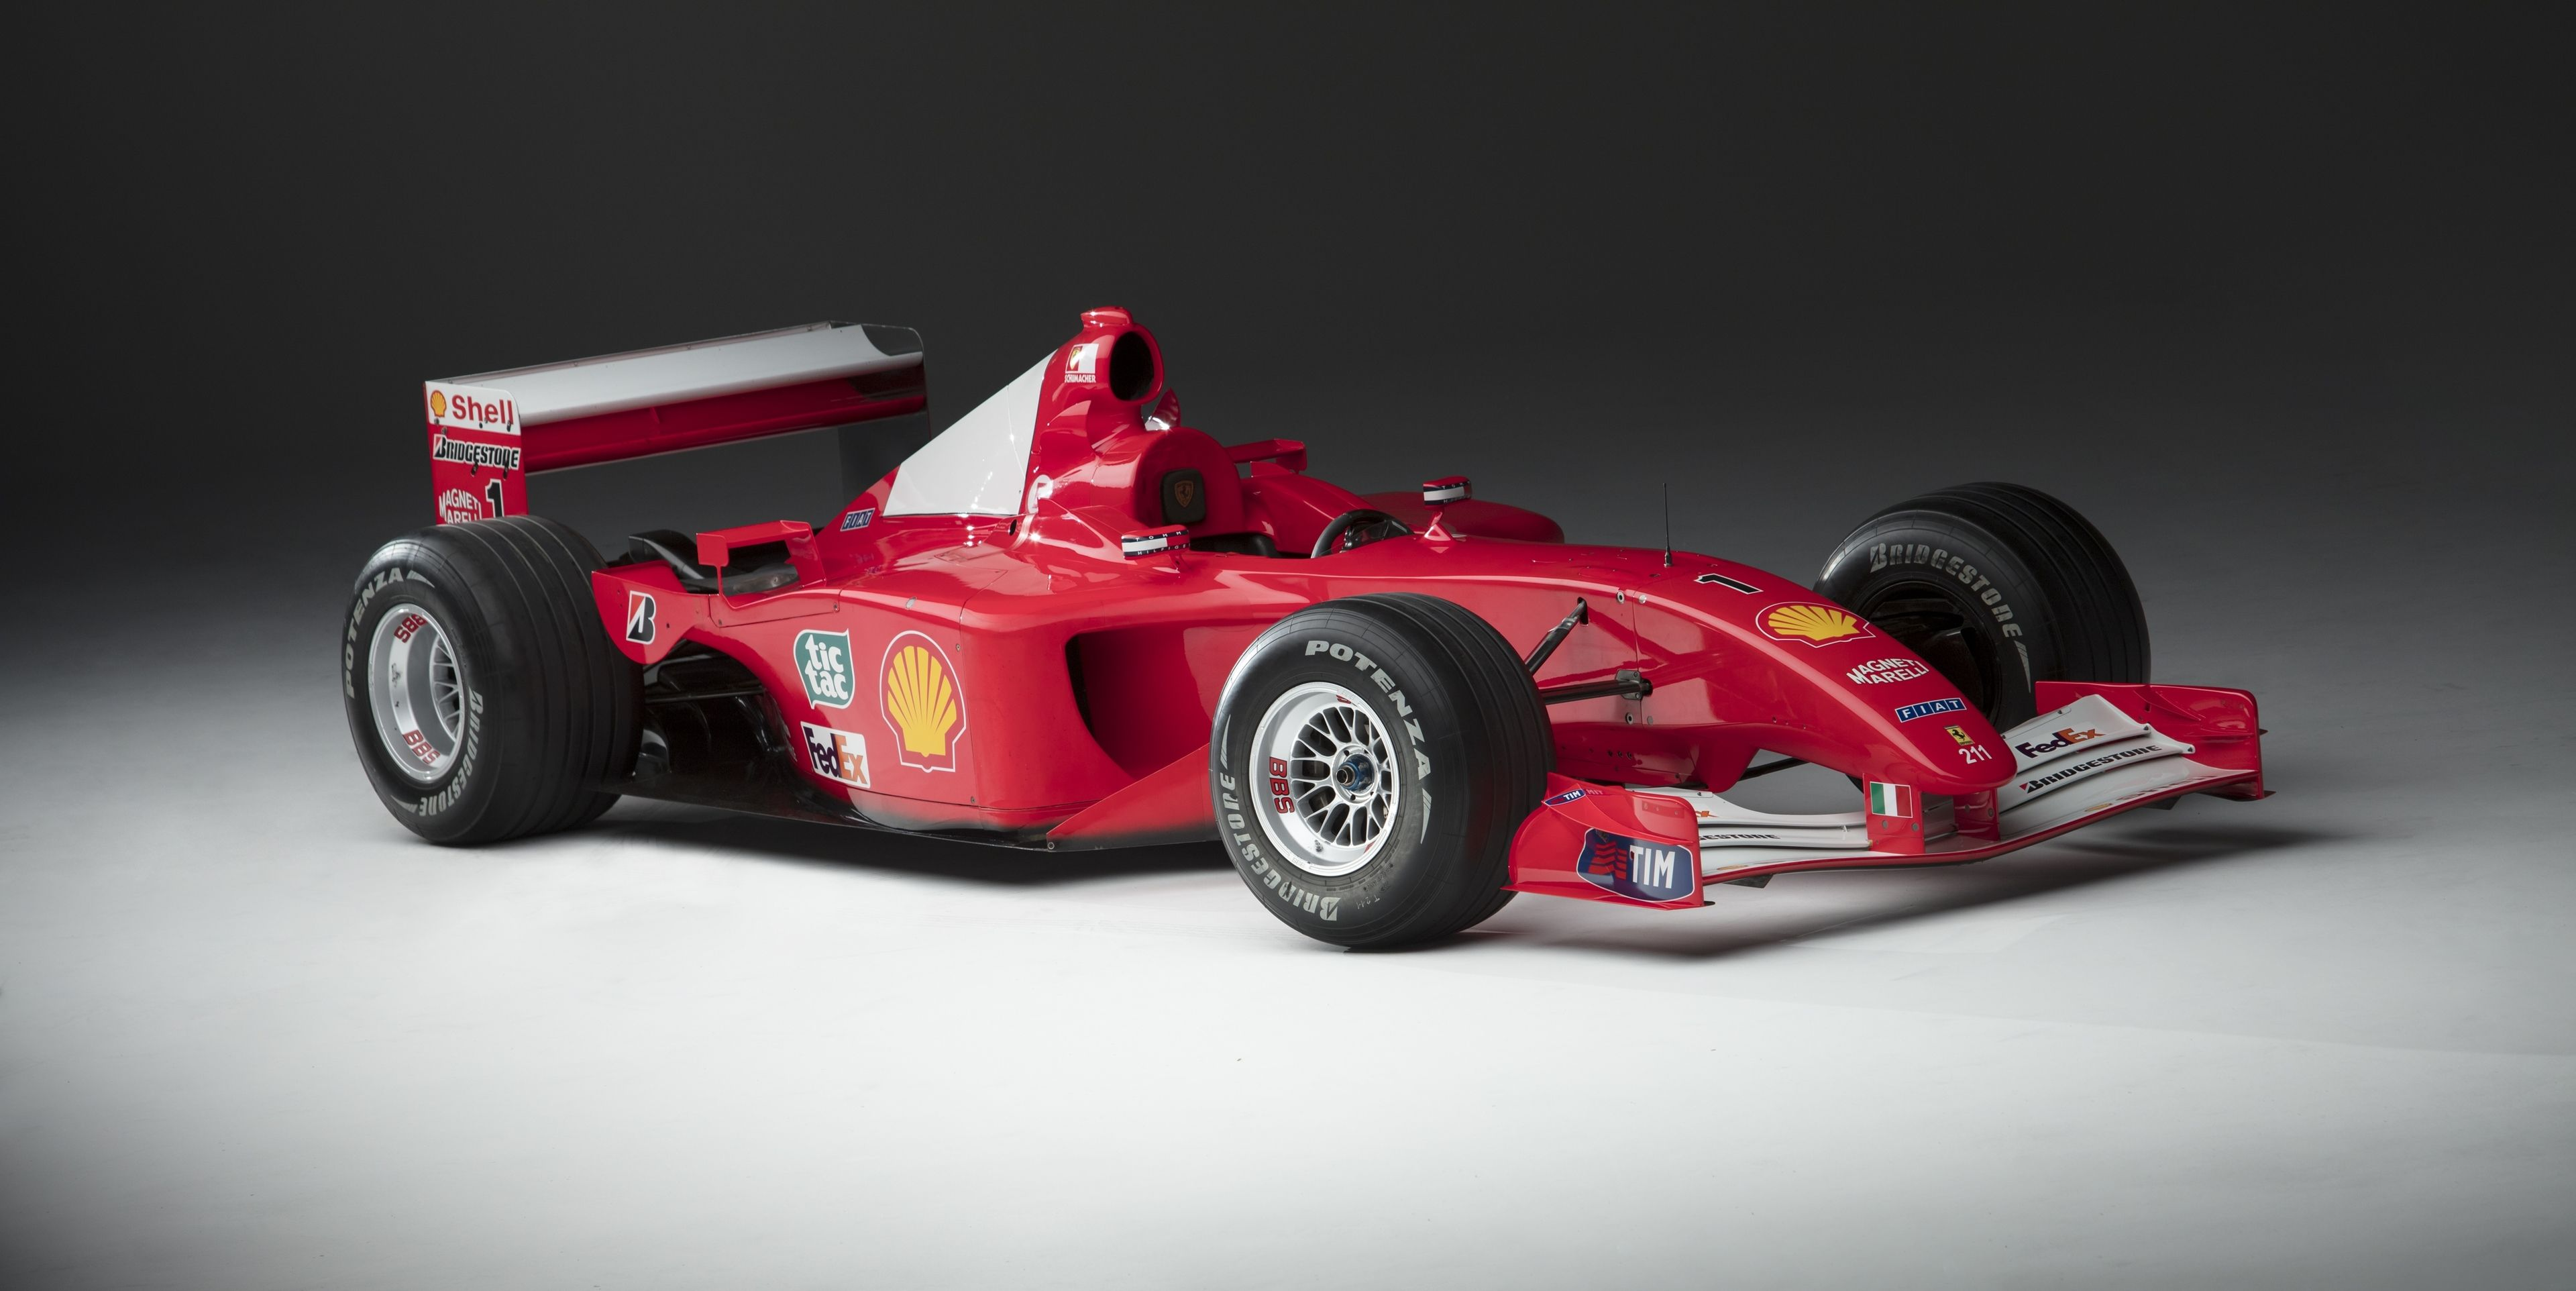 Schumacher's Ferrari F1 race car could sell for more than $4 million thumbnail